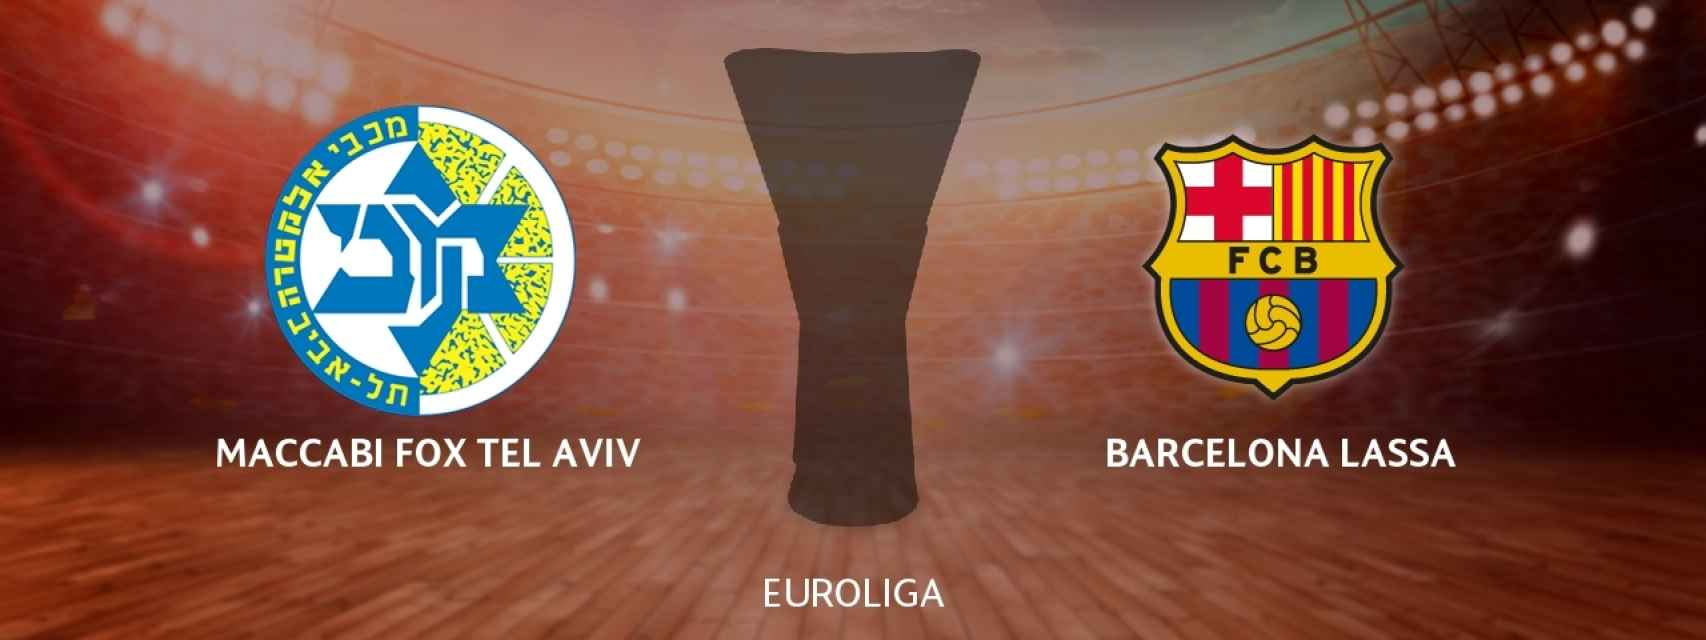 Maccabi Tel Aviv - Barcelona Lassa